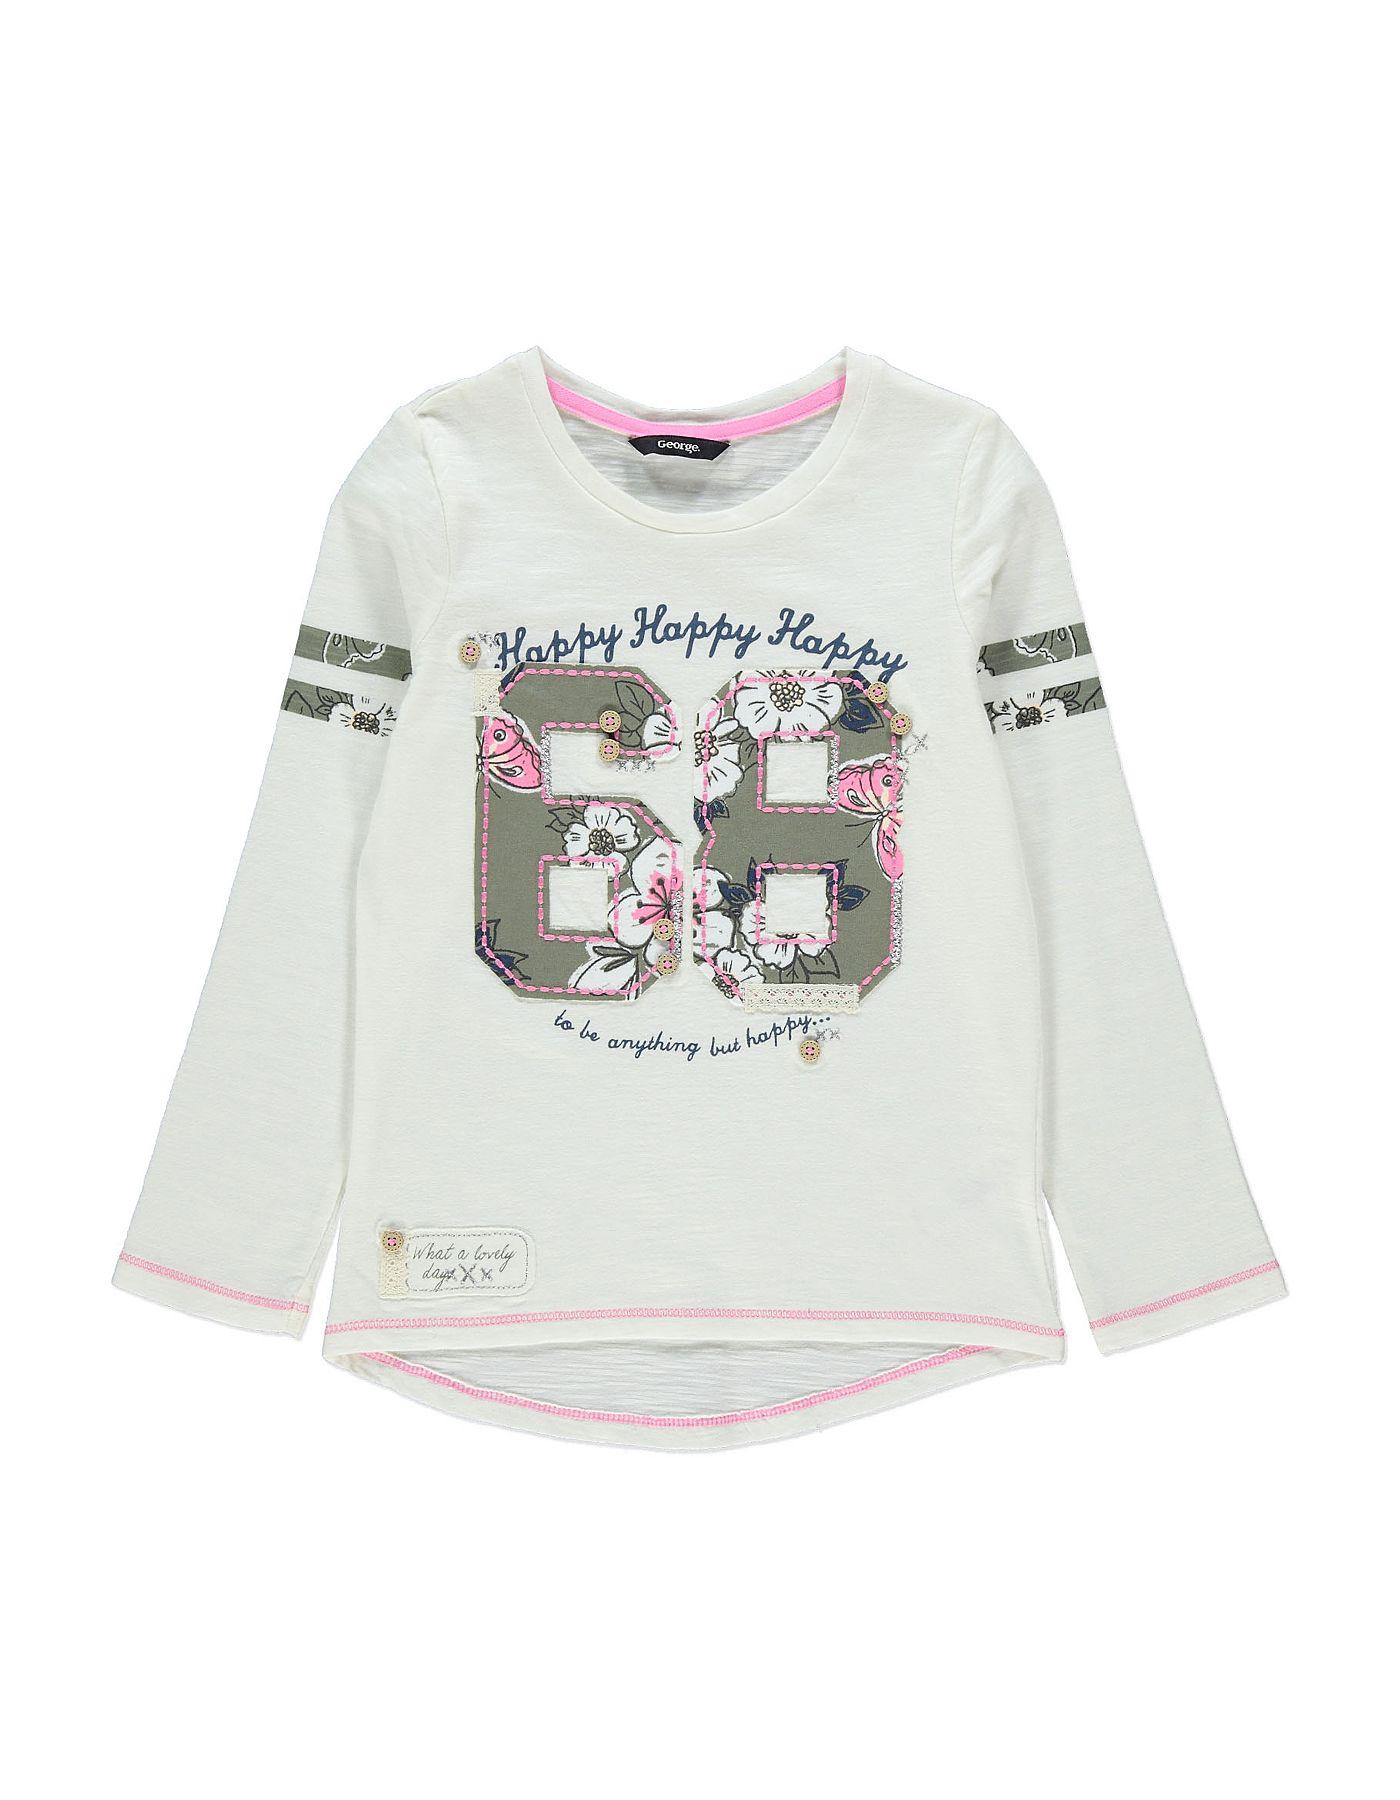 Black t shirt asda - Floral 68 Top Girls George At Asda